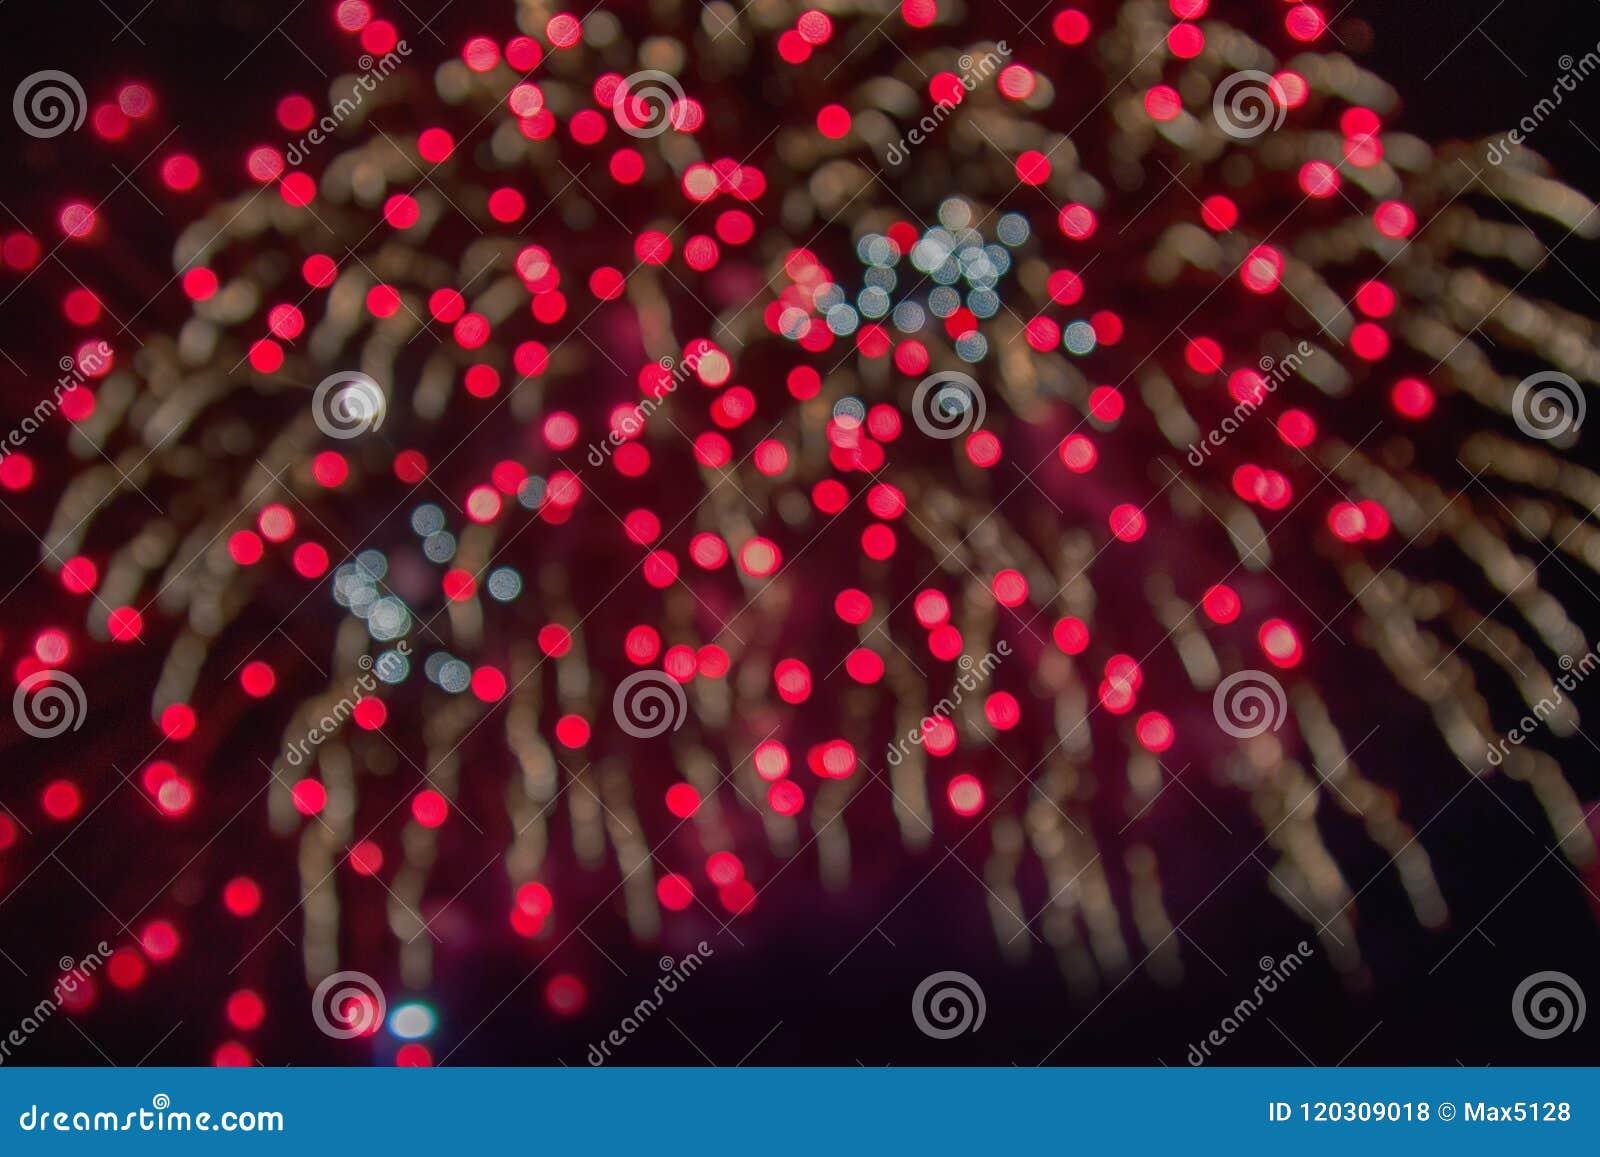 Fireworks Multi-colored Glare Stock Photo - Image of festive